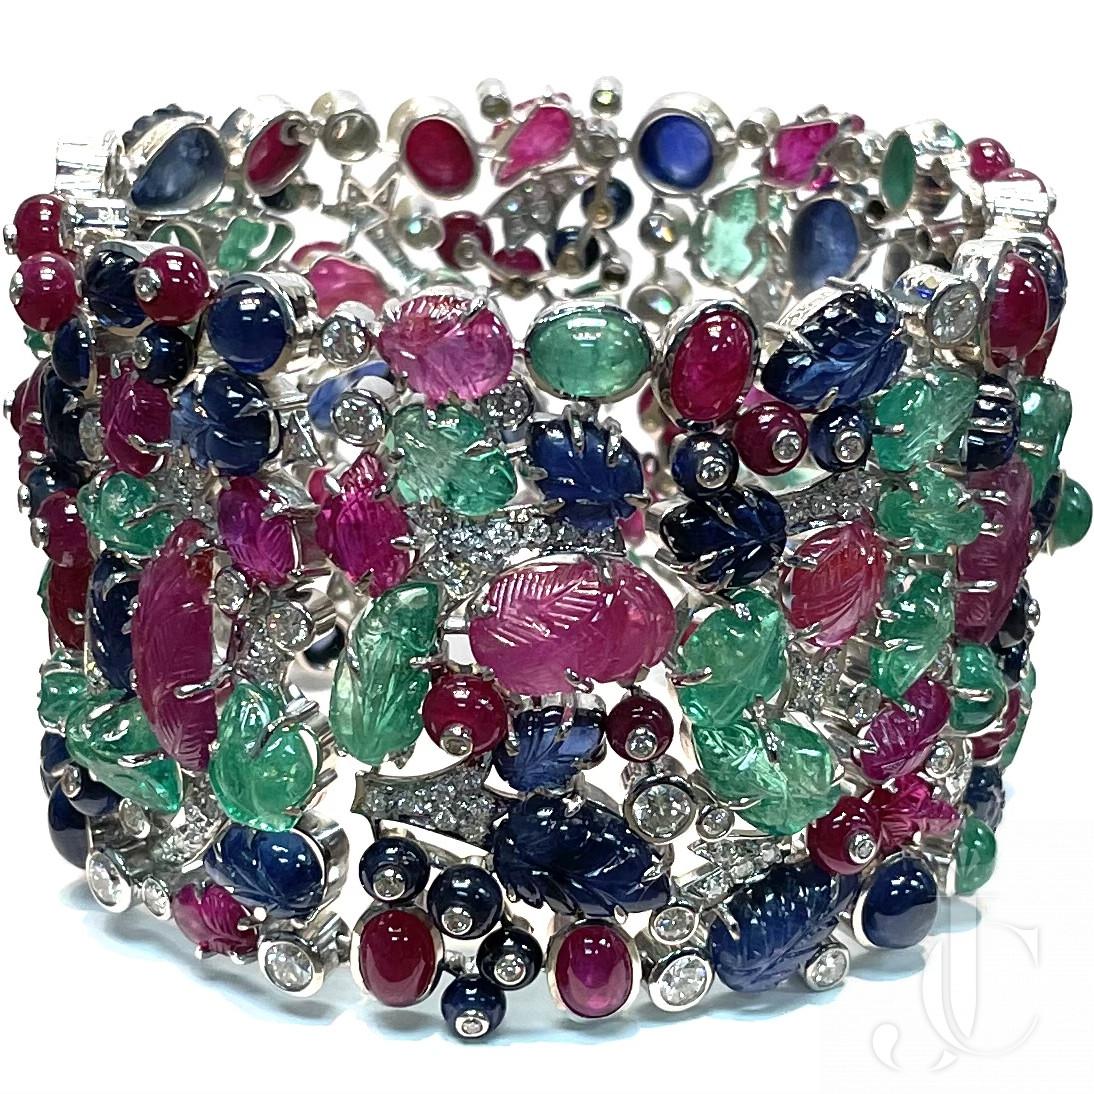 18KT. WG Tutti Frutti Cuff Bangle with very fine Emerald, Rubies, Sapphire with Diamonds